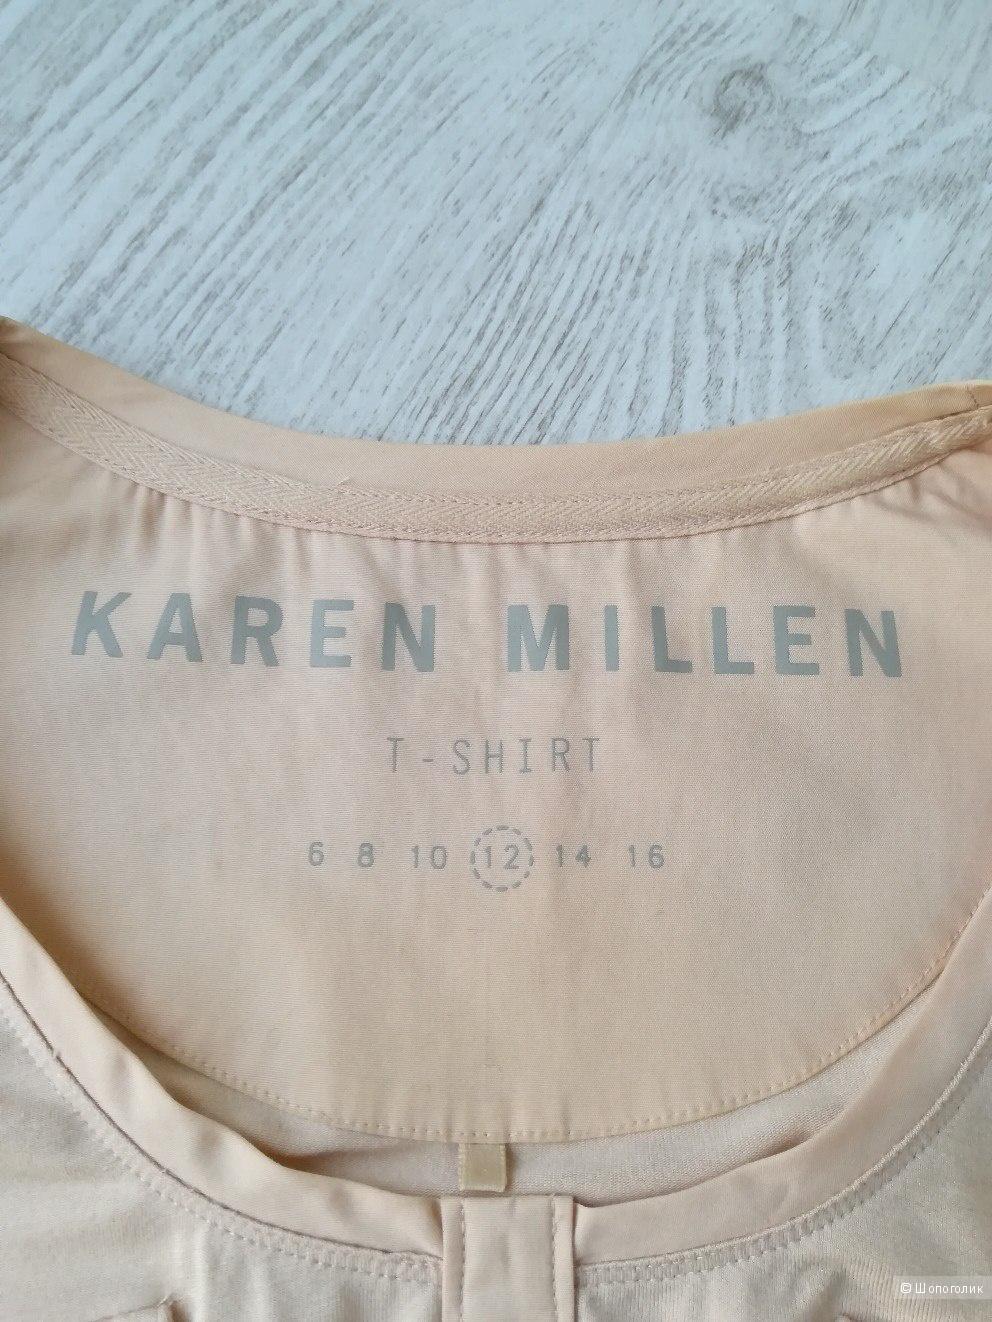 Кофта Karen millen, размер М/L